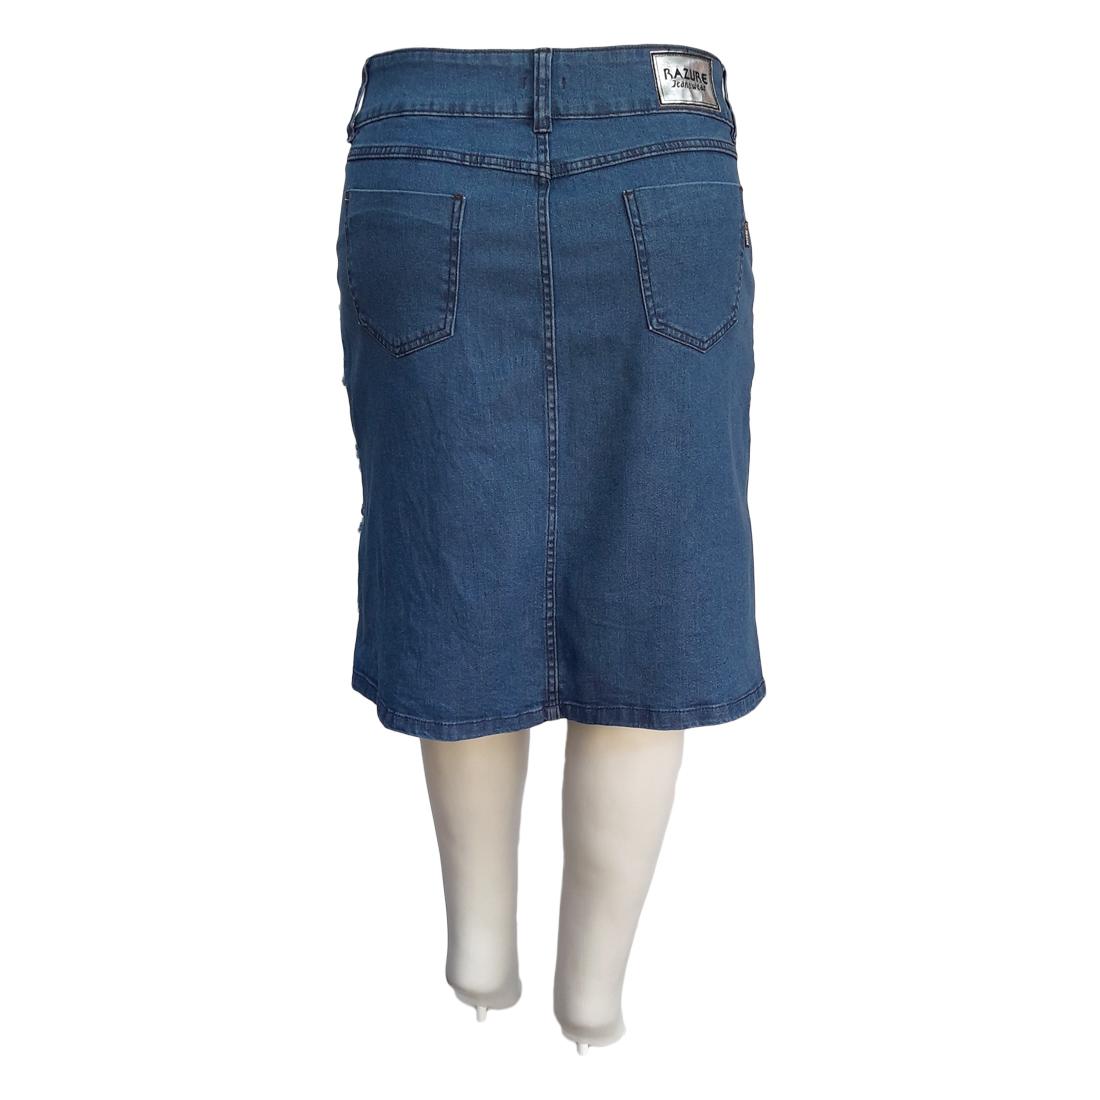 Saia Jeans Evasê Rasgada Moda Evangélica Plus Size